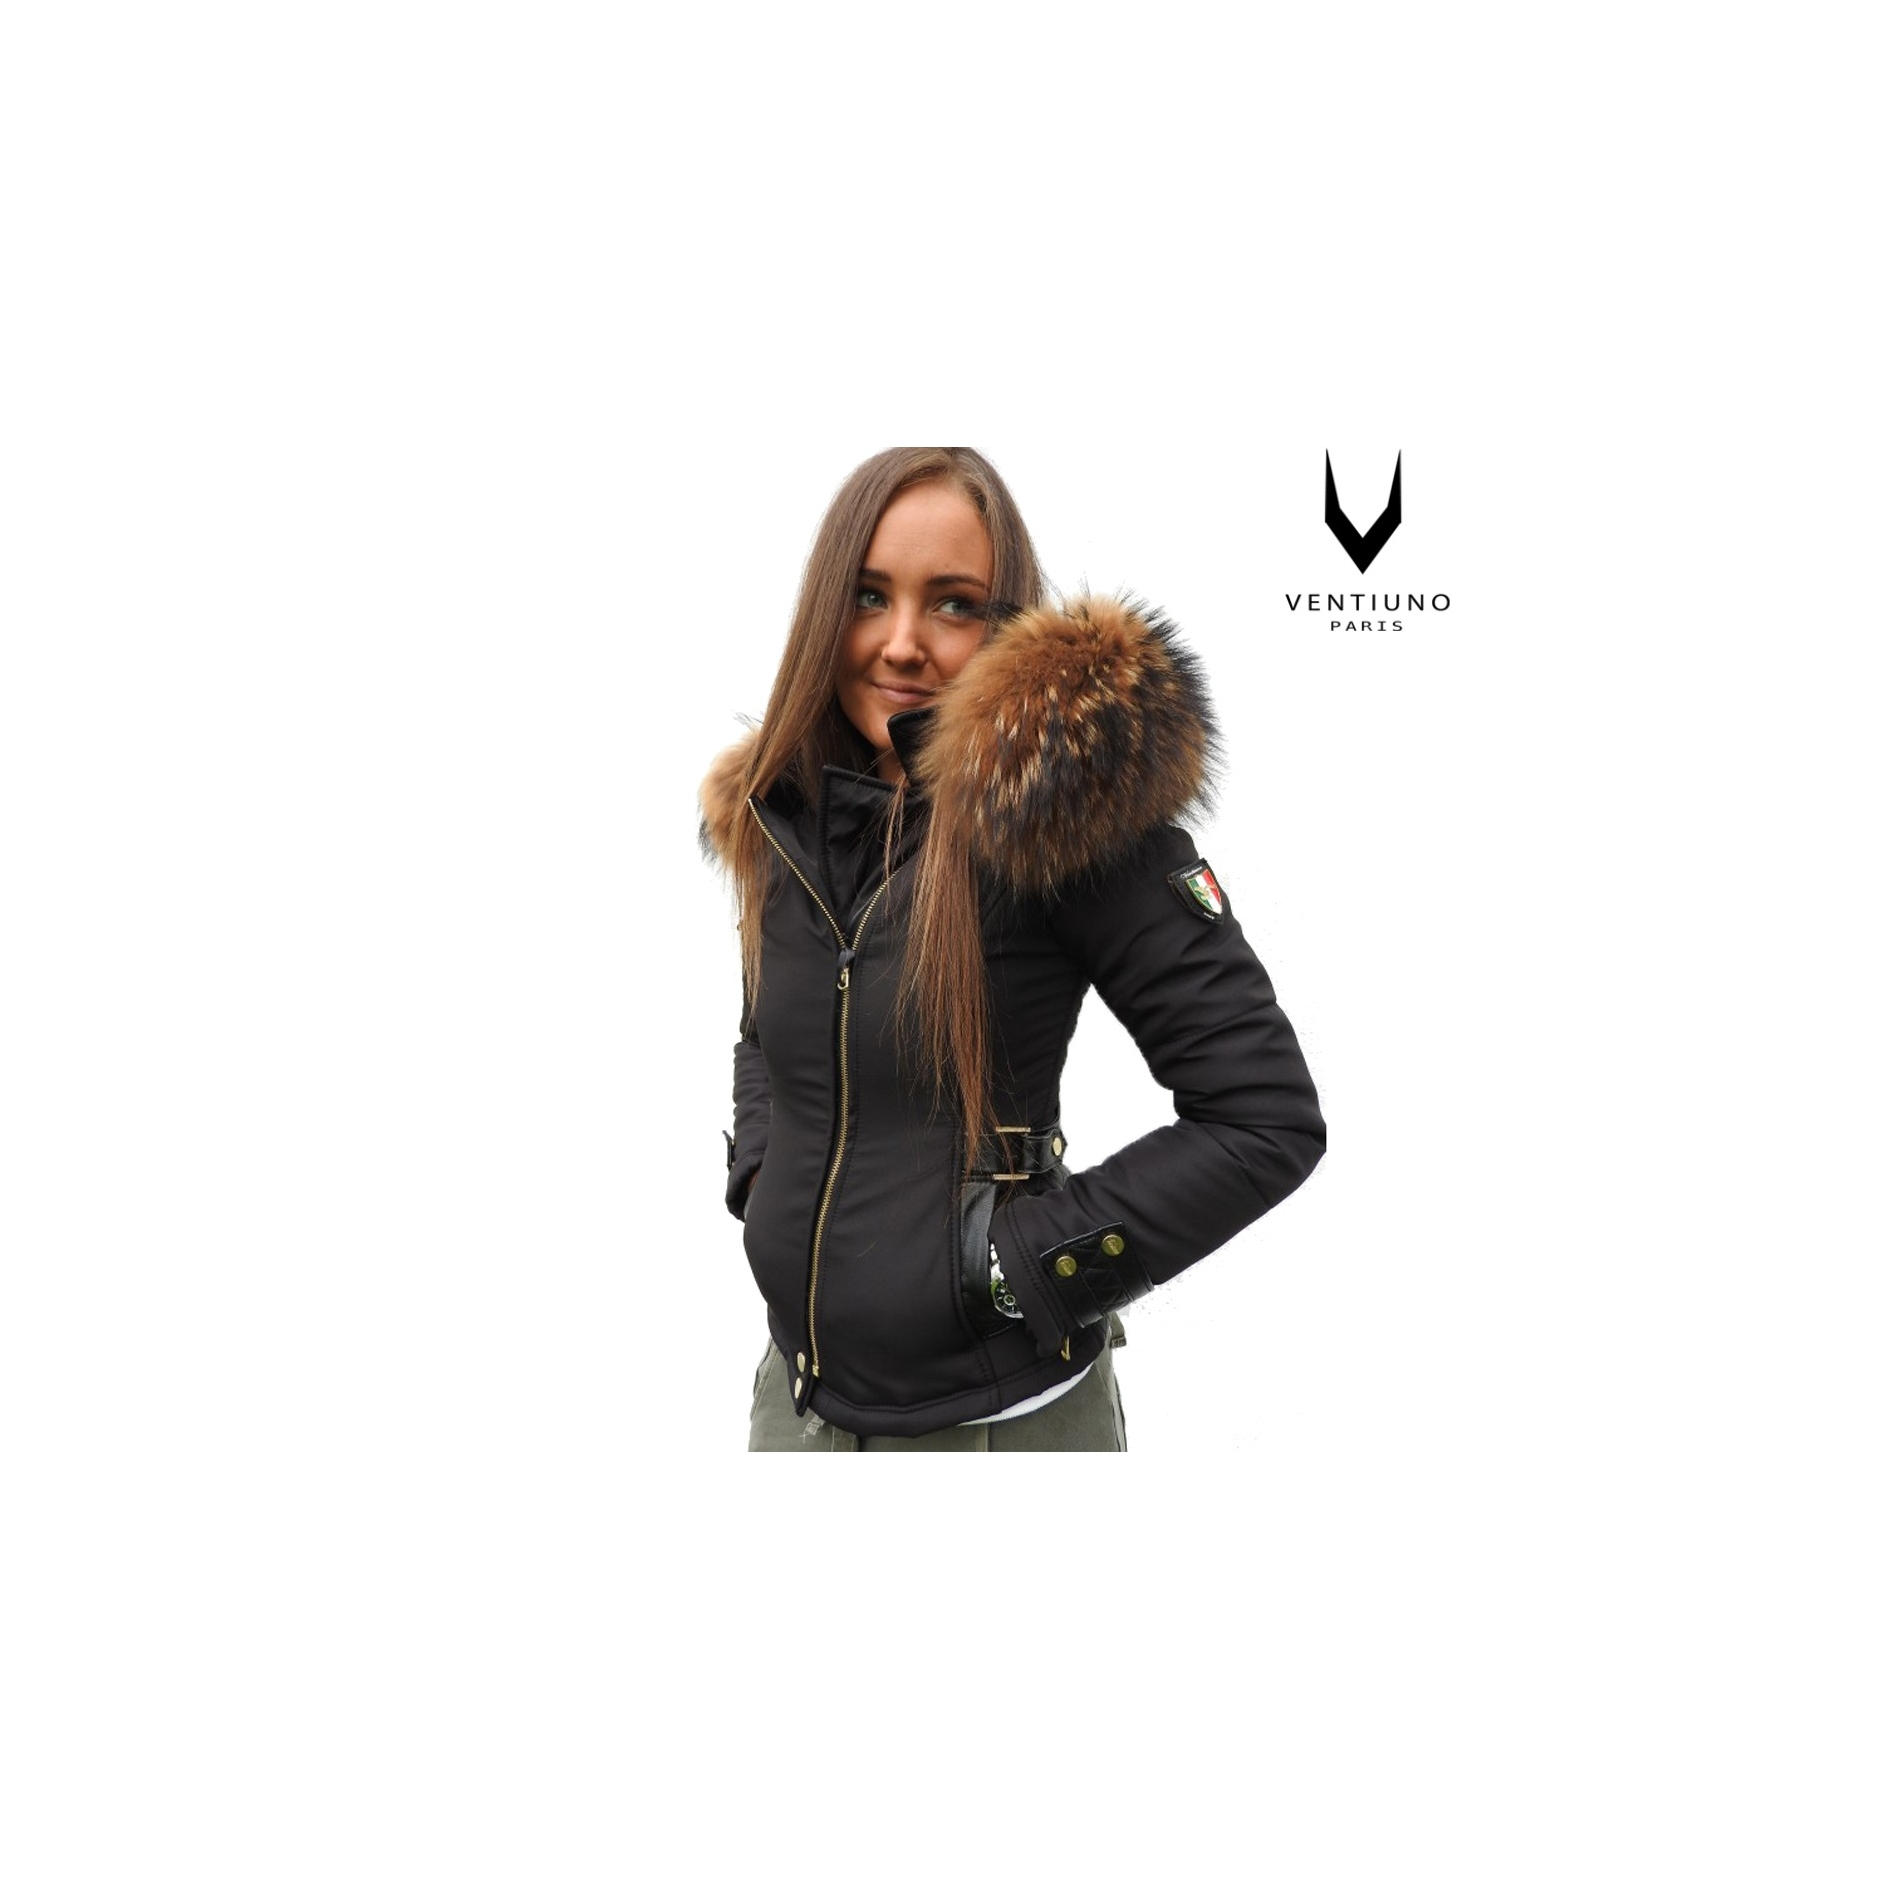 9d1432d8aad EMILY - SOFIA Ventiuno Veste doudoune perfecto fourrure véritable taille  MAX - cuir d agneau - doudoune ventiuno